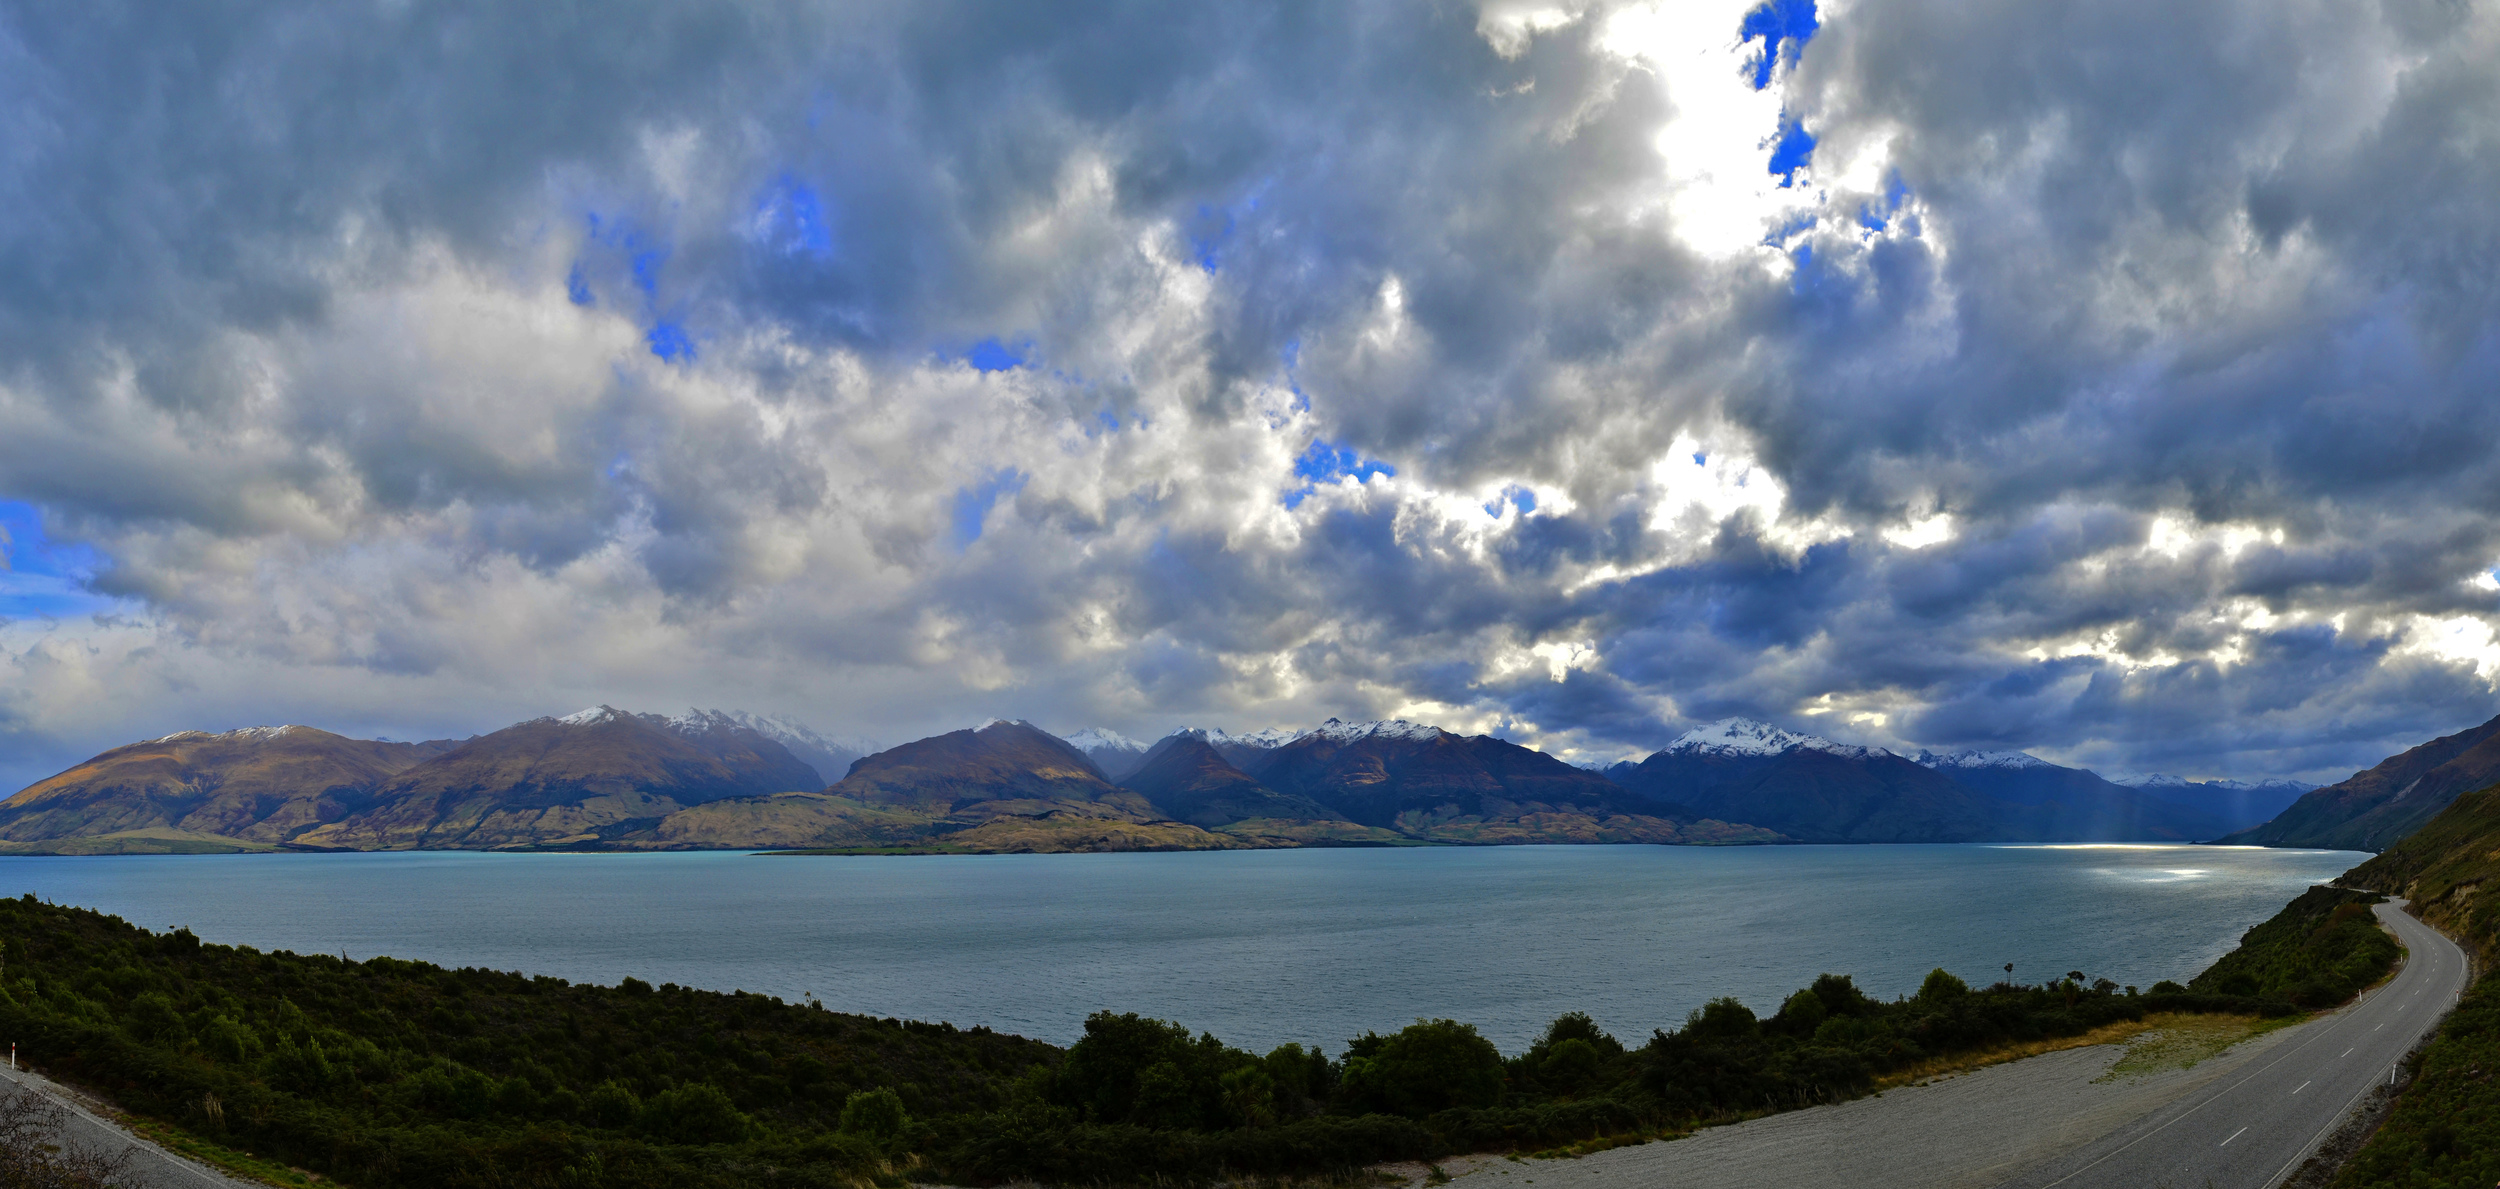 [15] Views of Lake Wanaka, South Island.